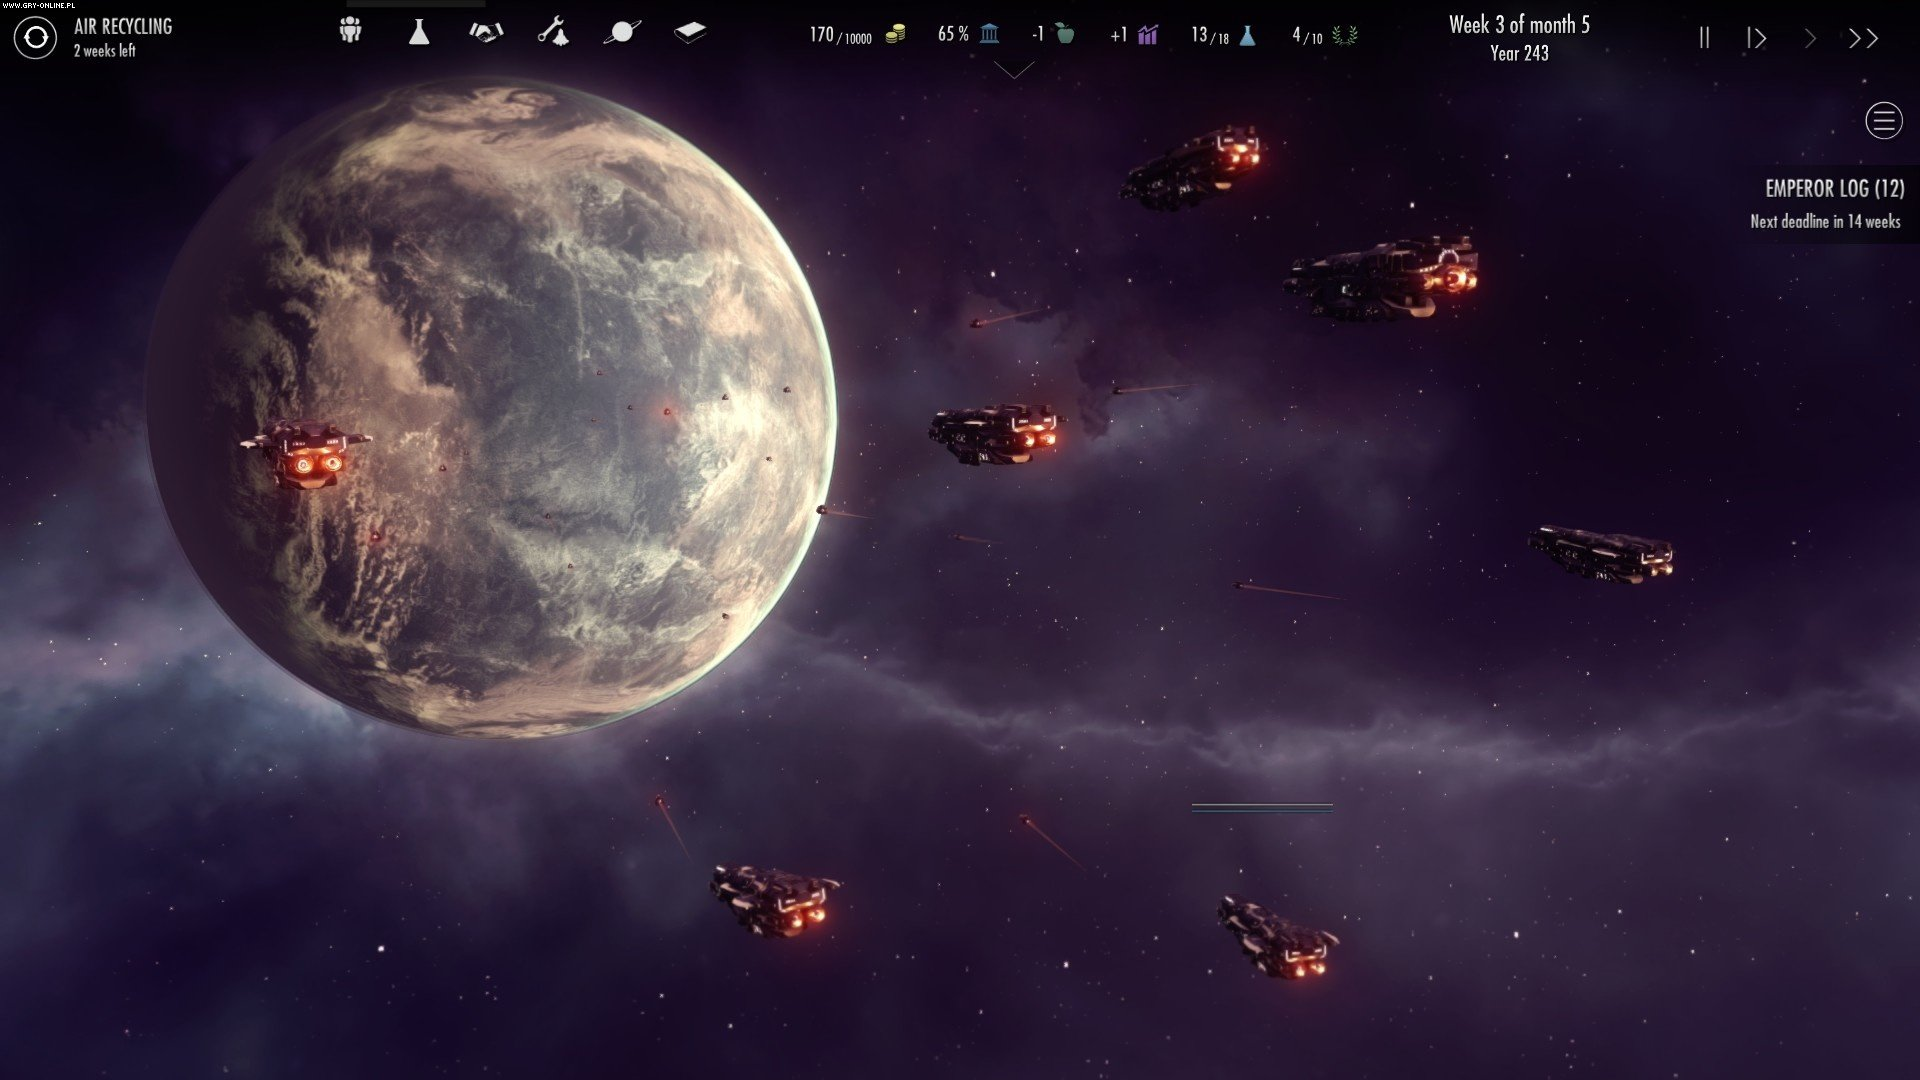 Dawn of Andromeda PC Games Image 6/24, Grey Wolf Entertainment, Iceberg Interactive